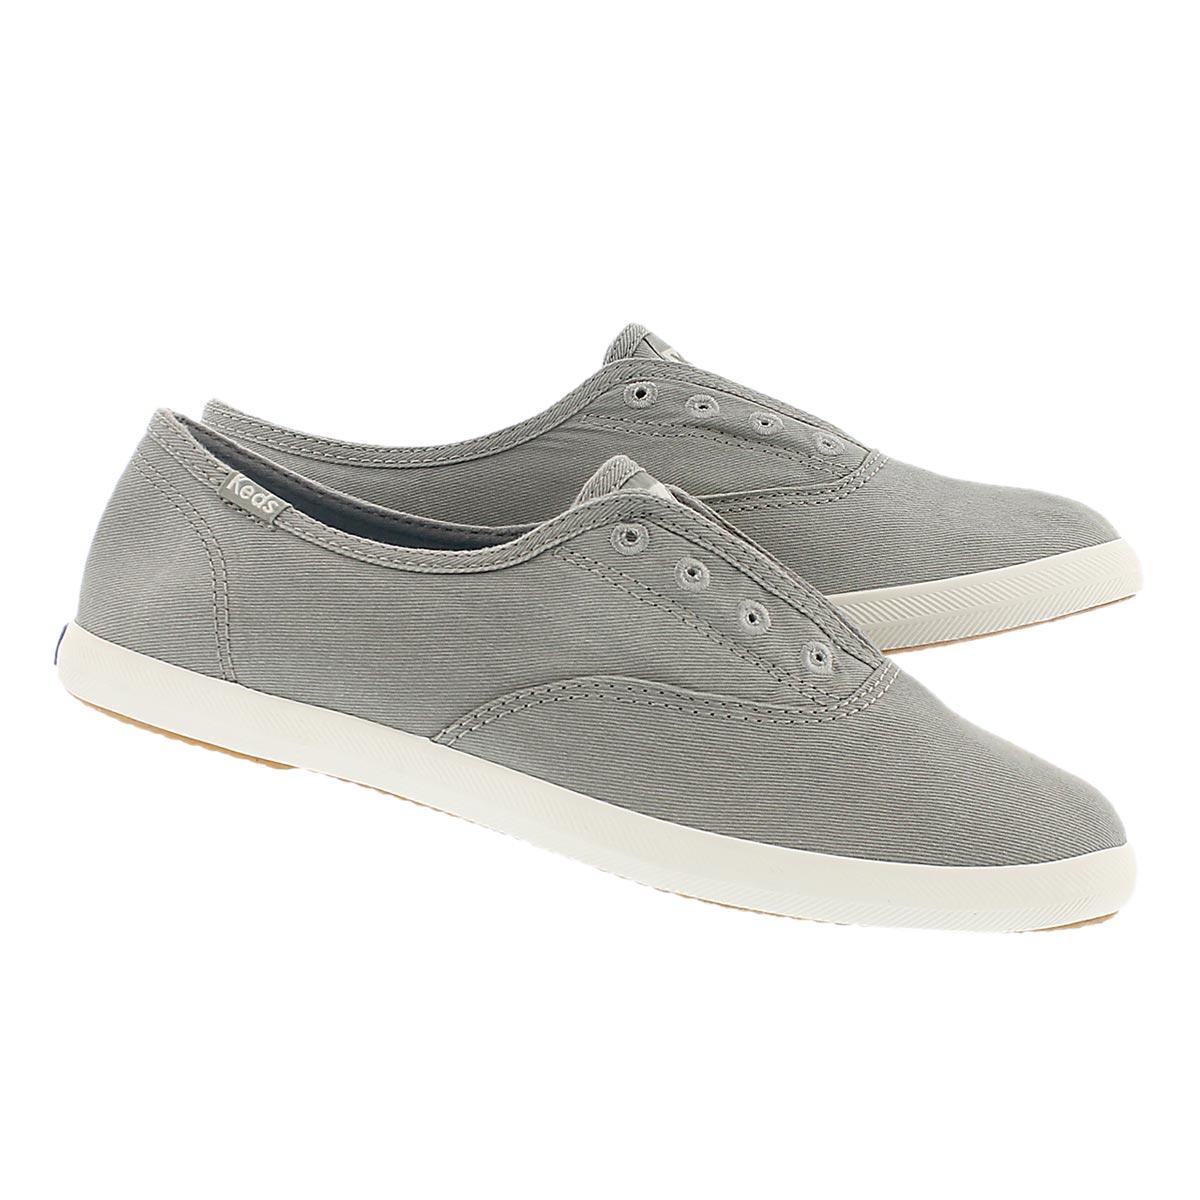 Lds Chillax grey fashion sneaker